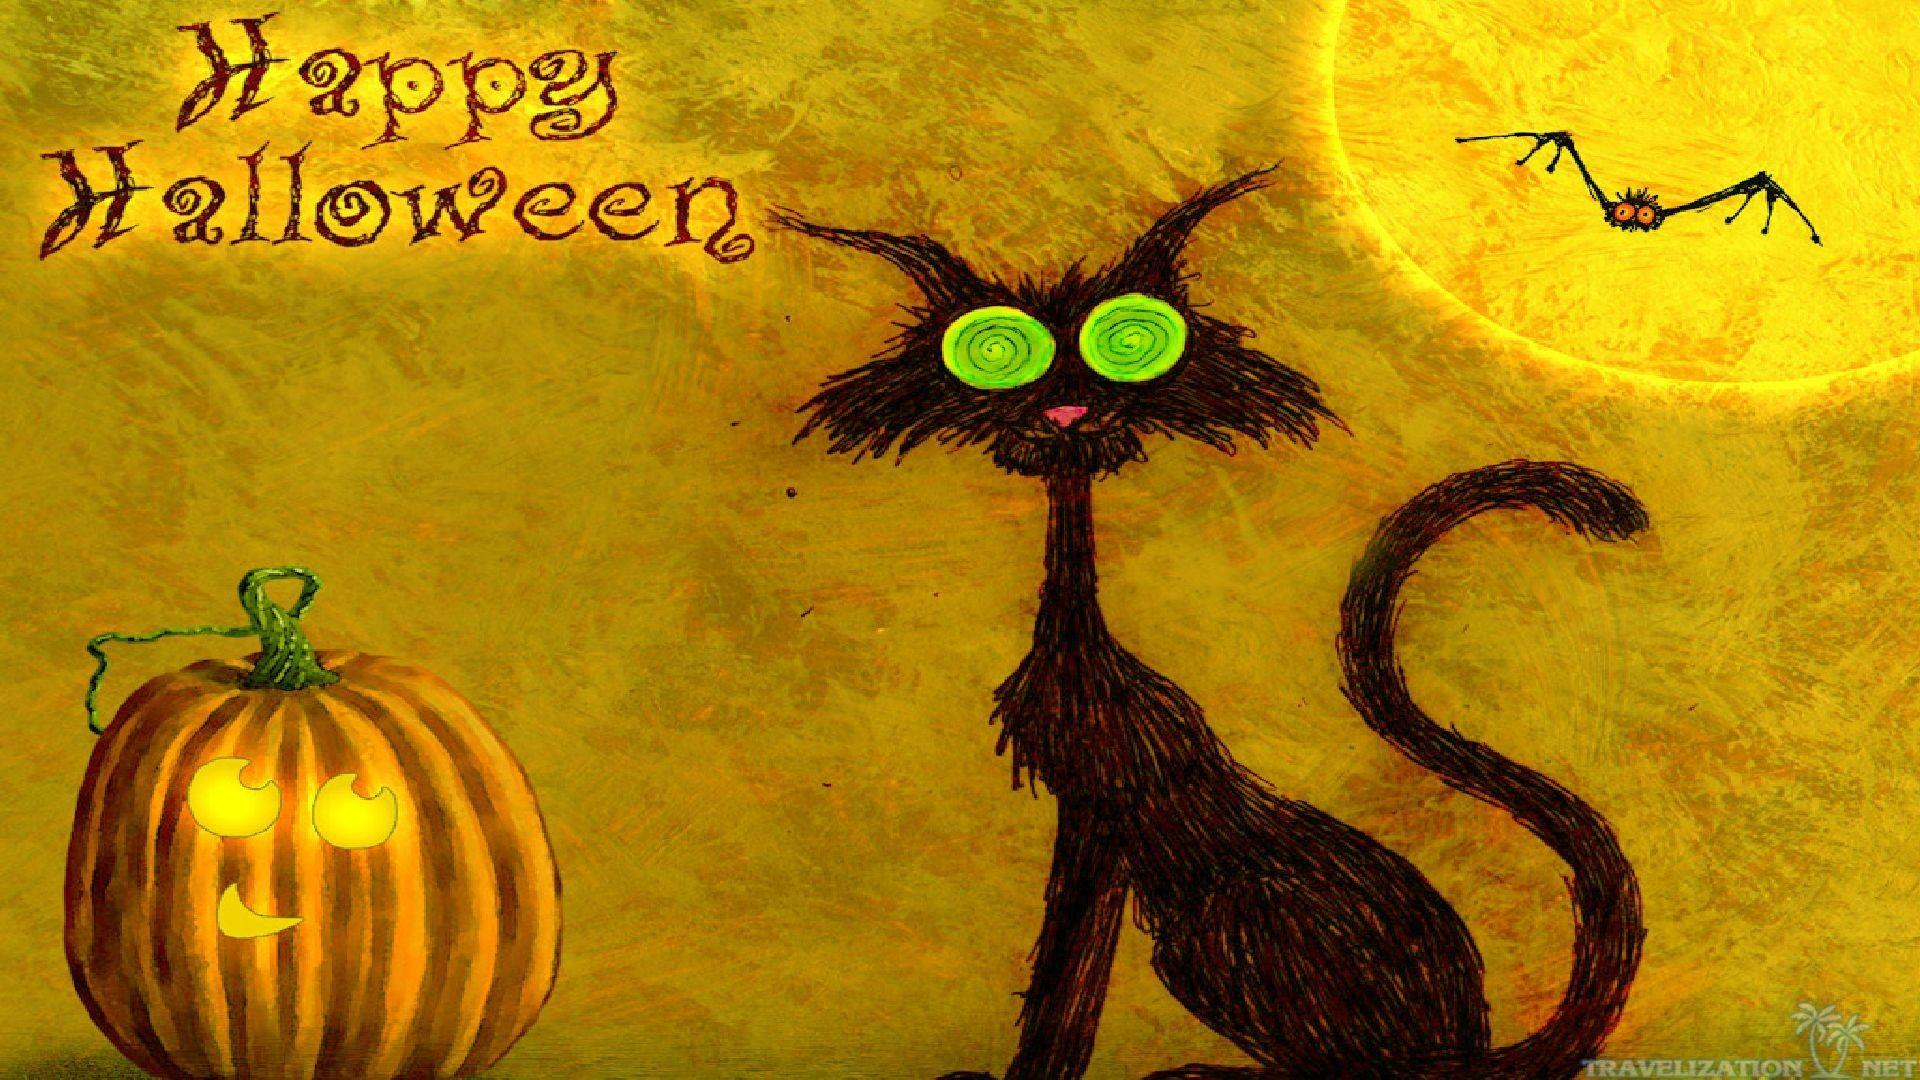 happy-halloween-trippy-cat-wallpapers-1920×1080-by-Igorexax